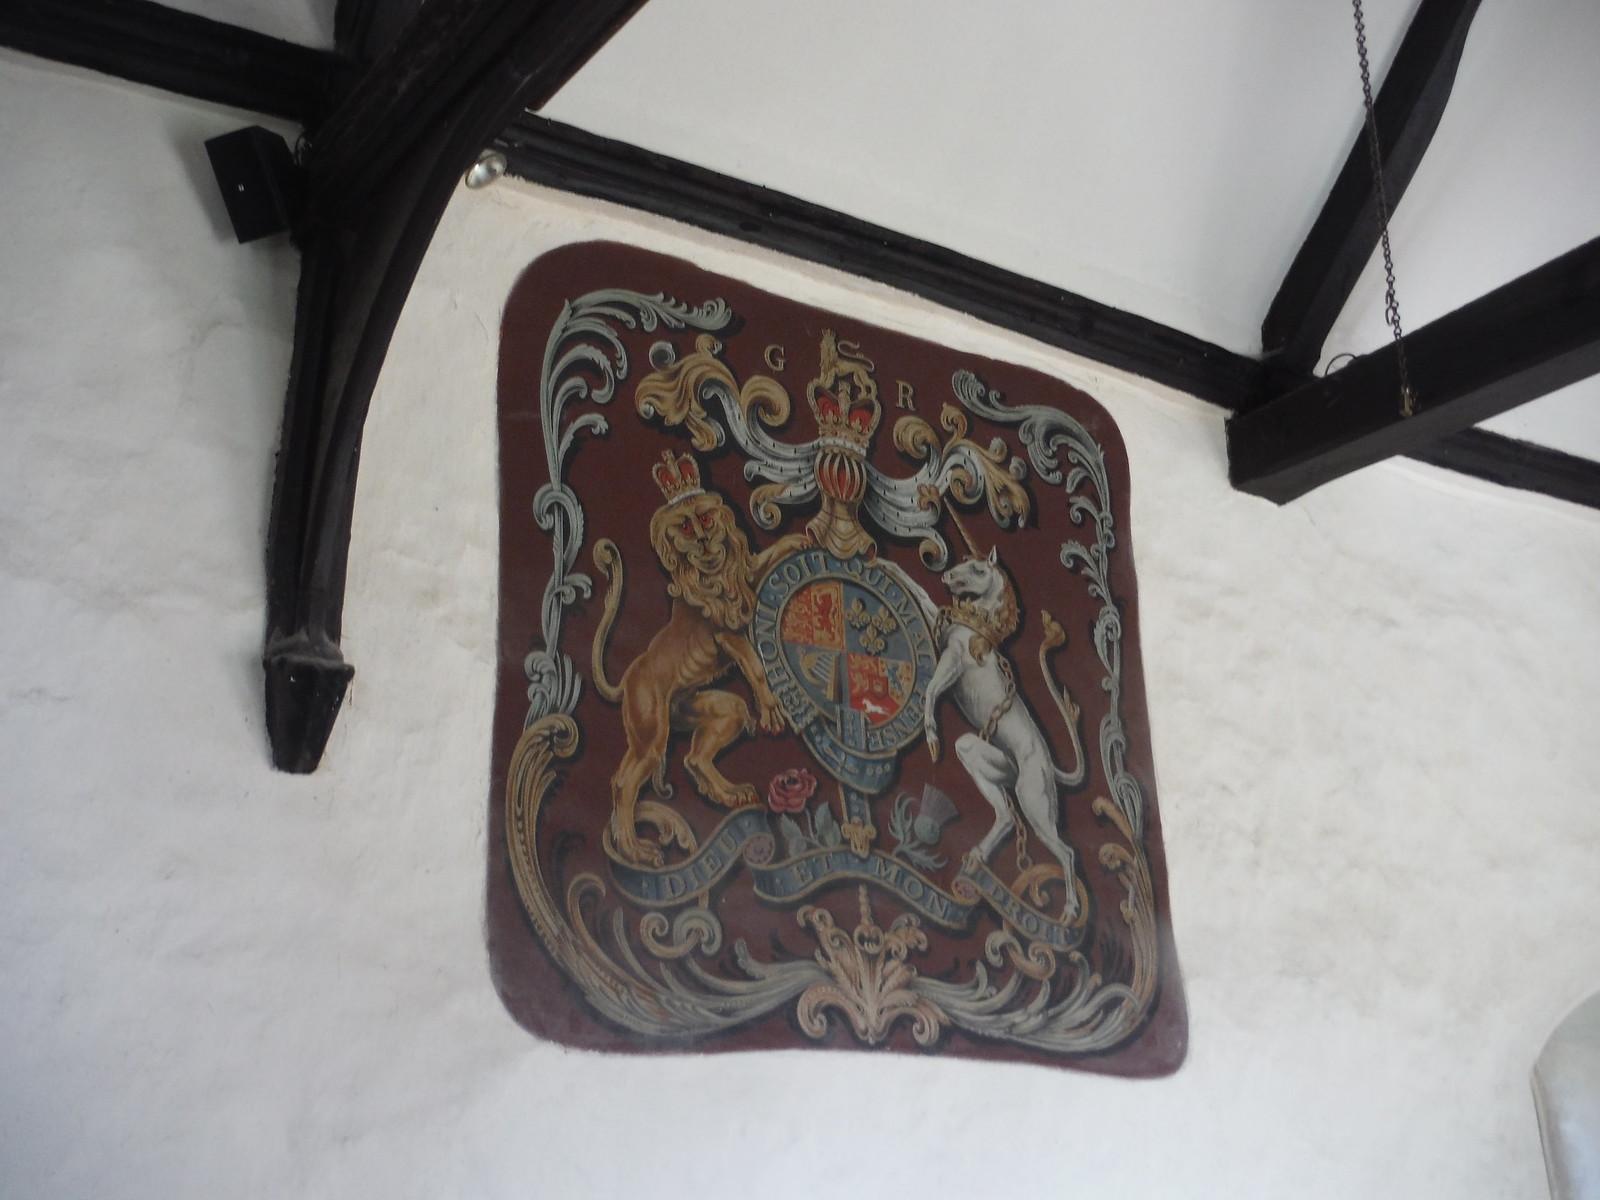 St. Nicholas Church, Chearsley, coat of arms SWC Walk 193 Haddenham to Aylesbury (via Gibraltar and Ford)